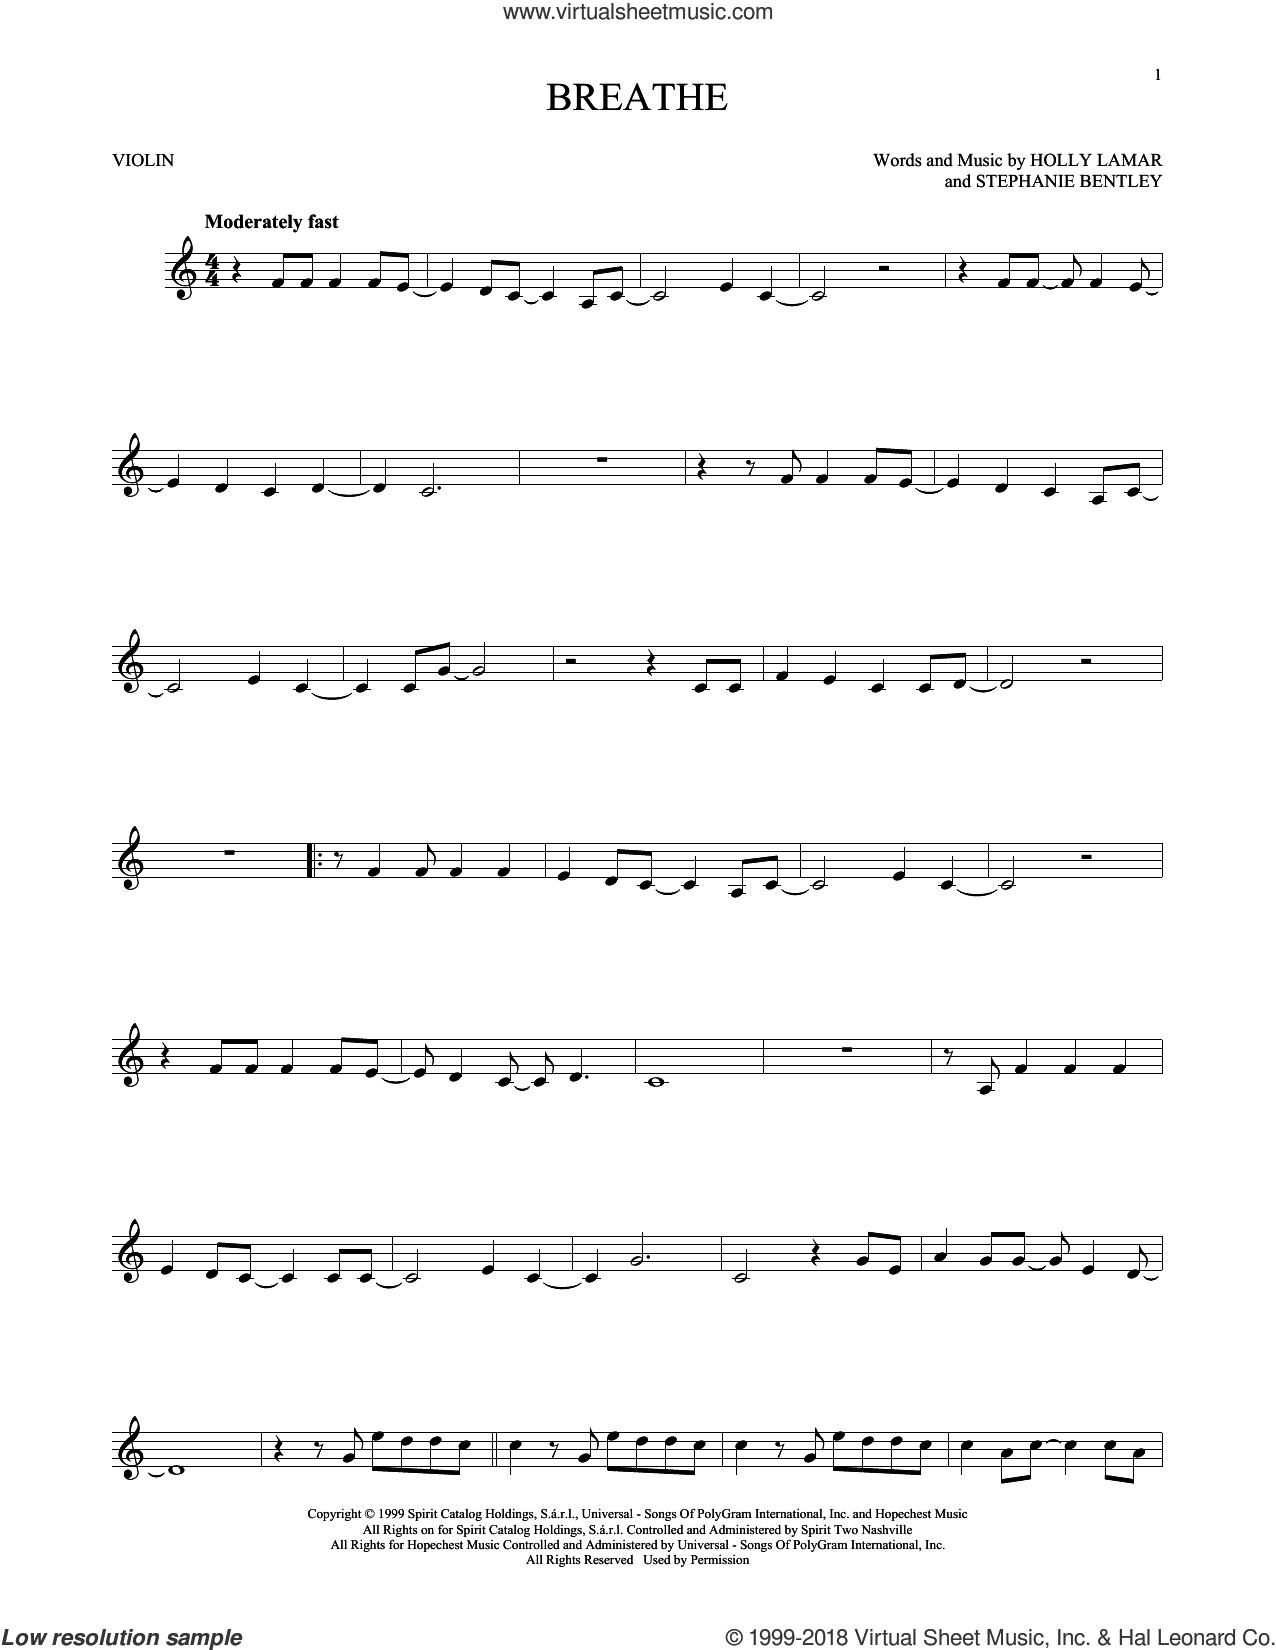 Breathe sheet music for violin solo by Faith Hill, Holly Lamar and Stephanie Bentley, intermediate skill level